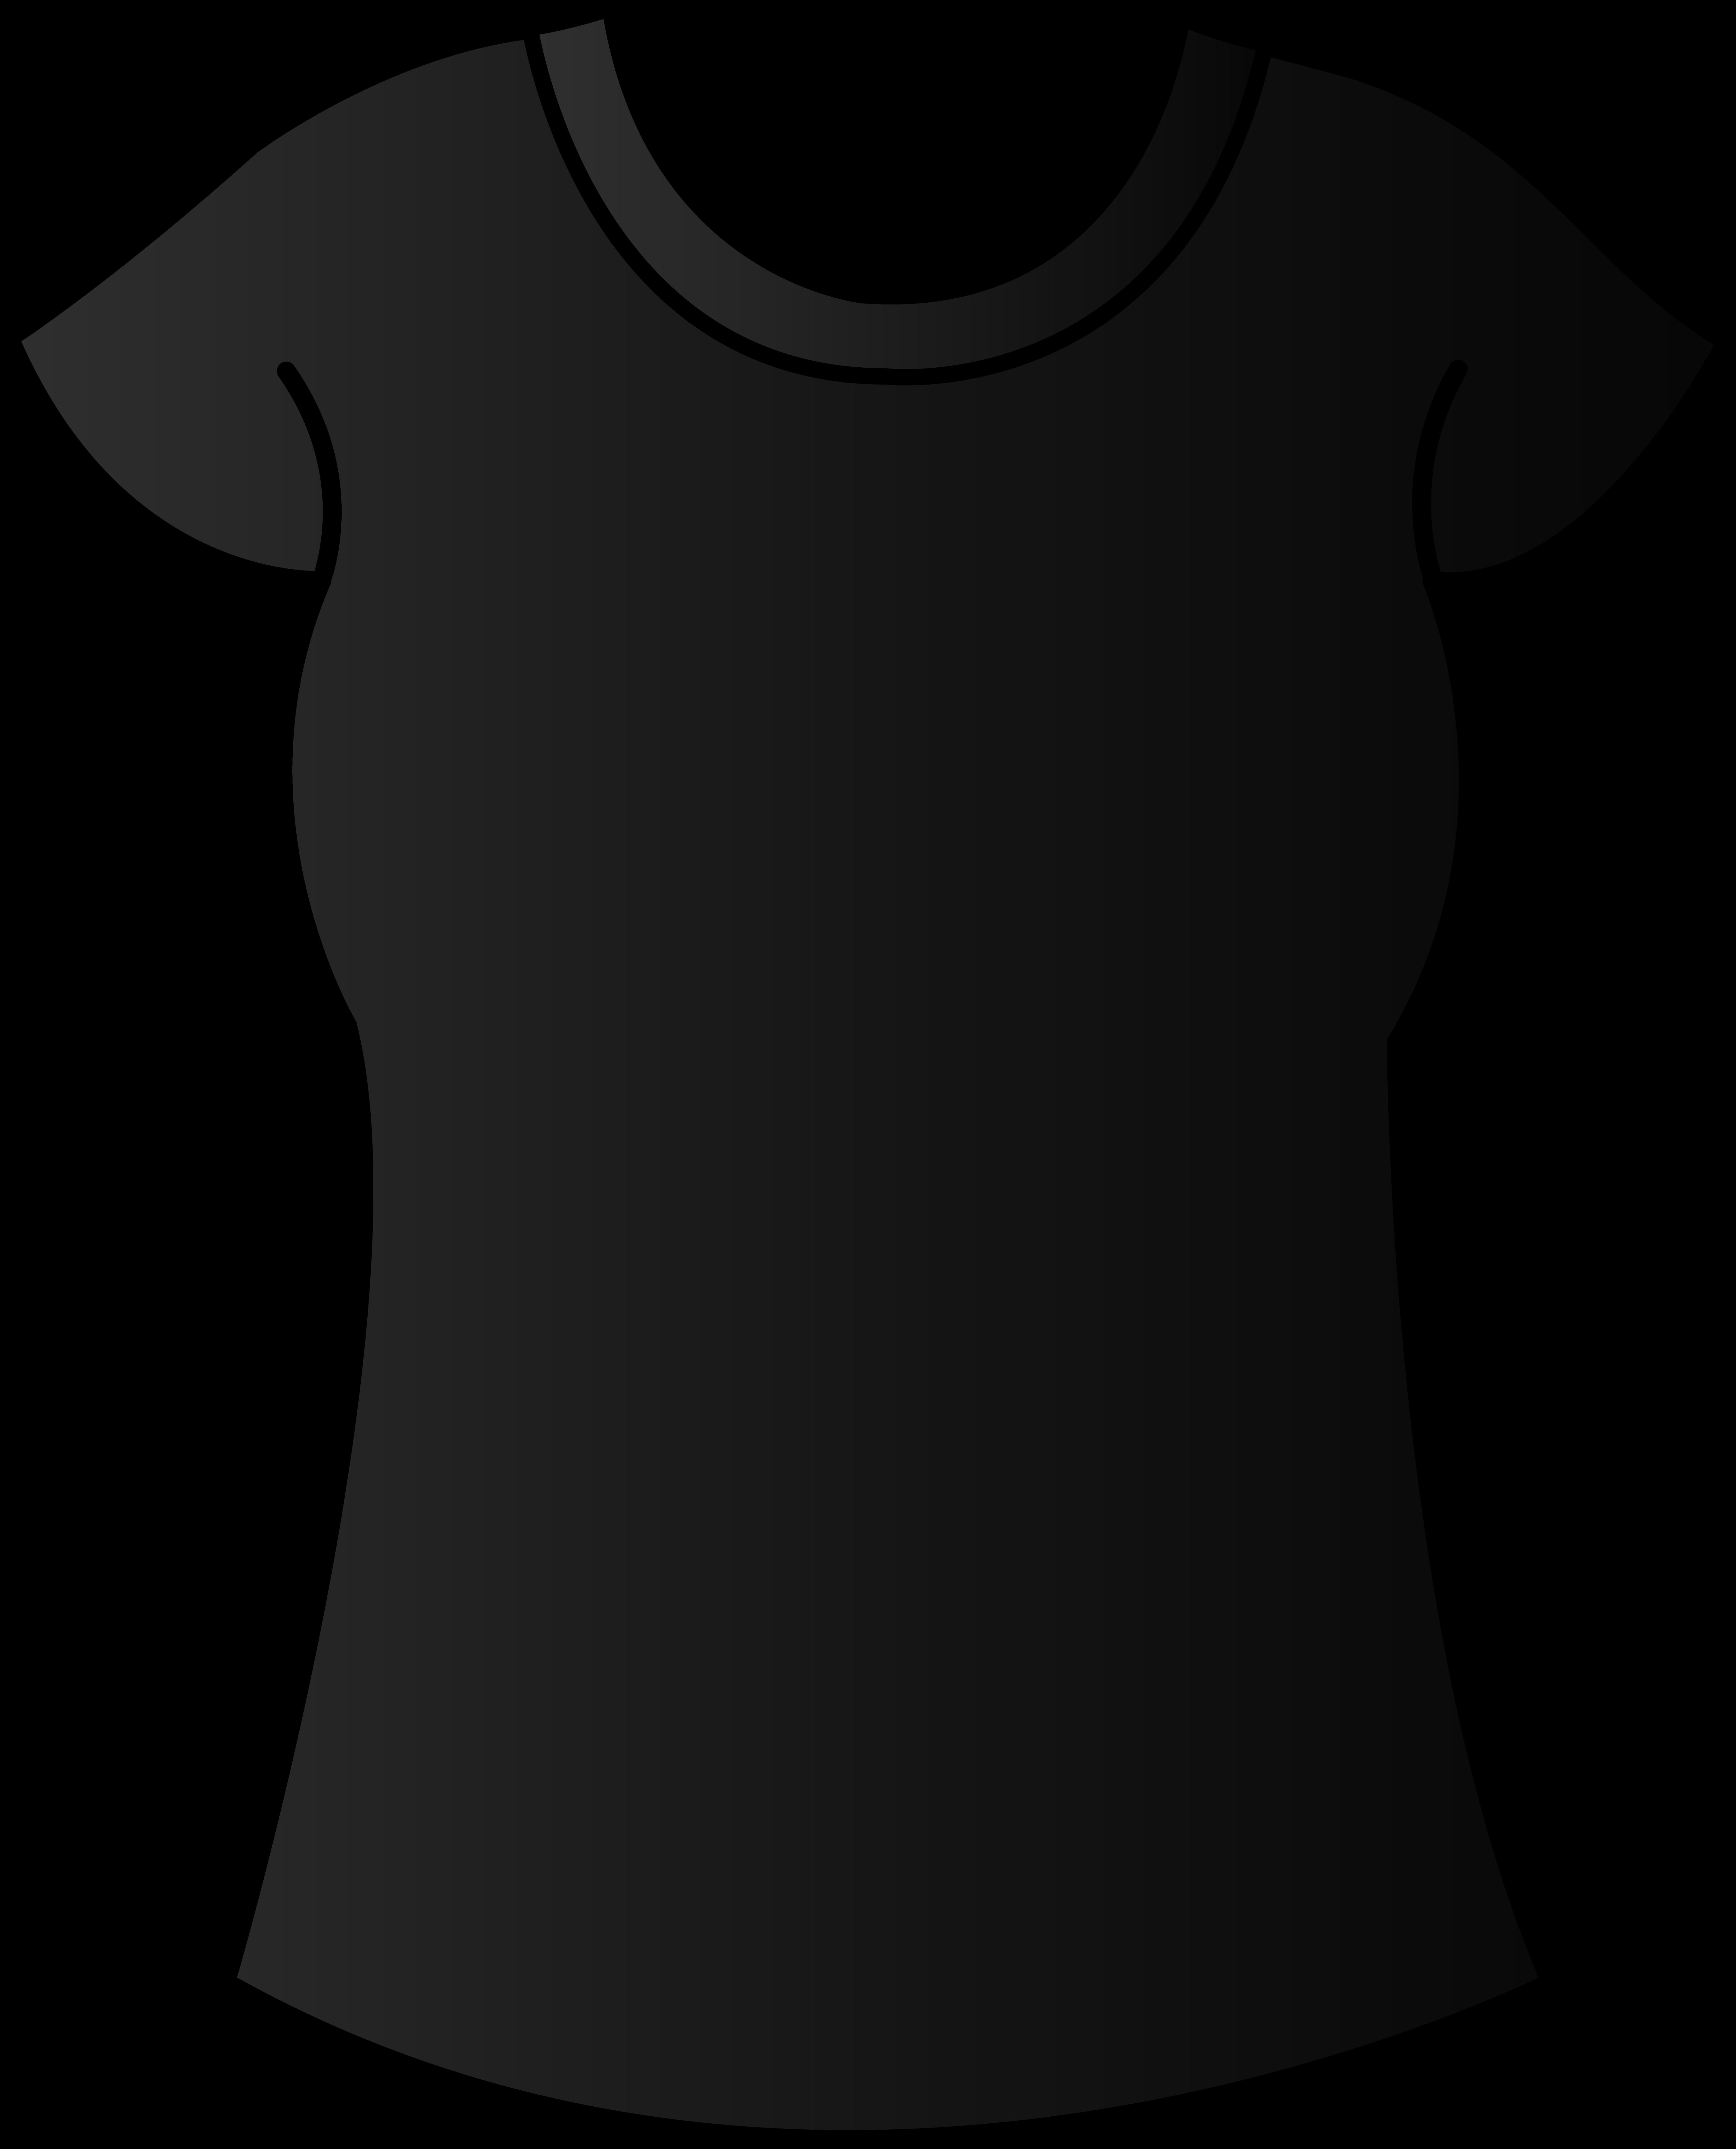 Women s shirt clipart jpg download Free Women Shirt Cliparts, Download Free Clip Art, Free Clip ... jpg download